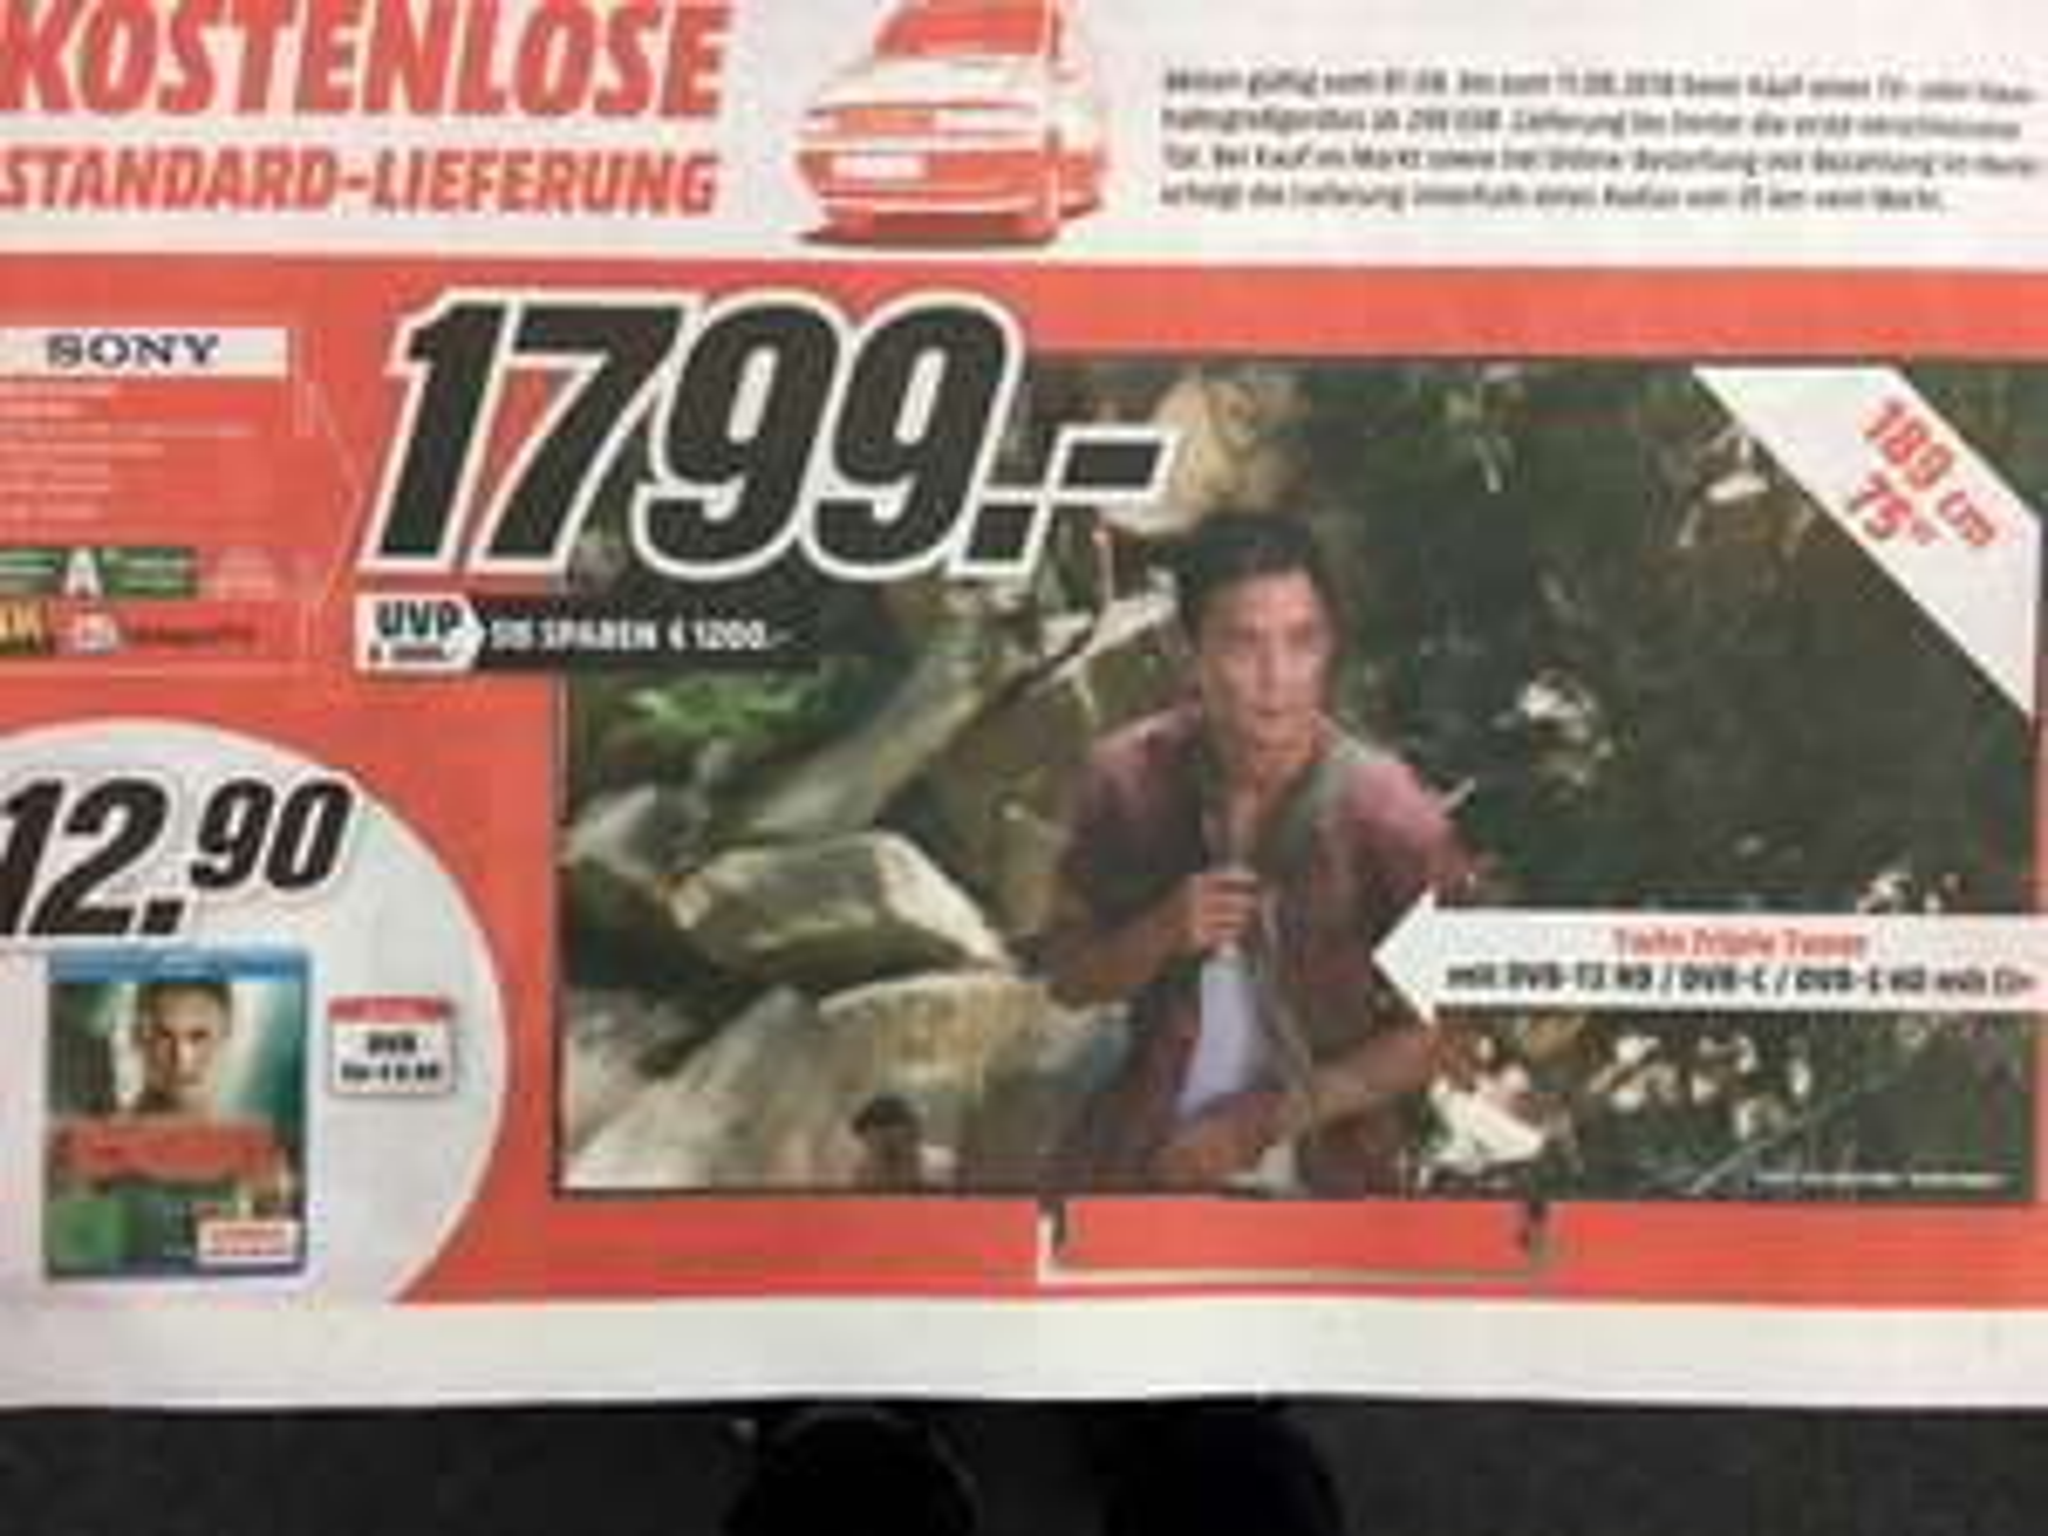 Sony 75 Zoll XE8596 lokal München Pasing Mediamarkt gratis Lieferung